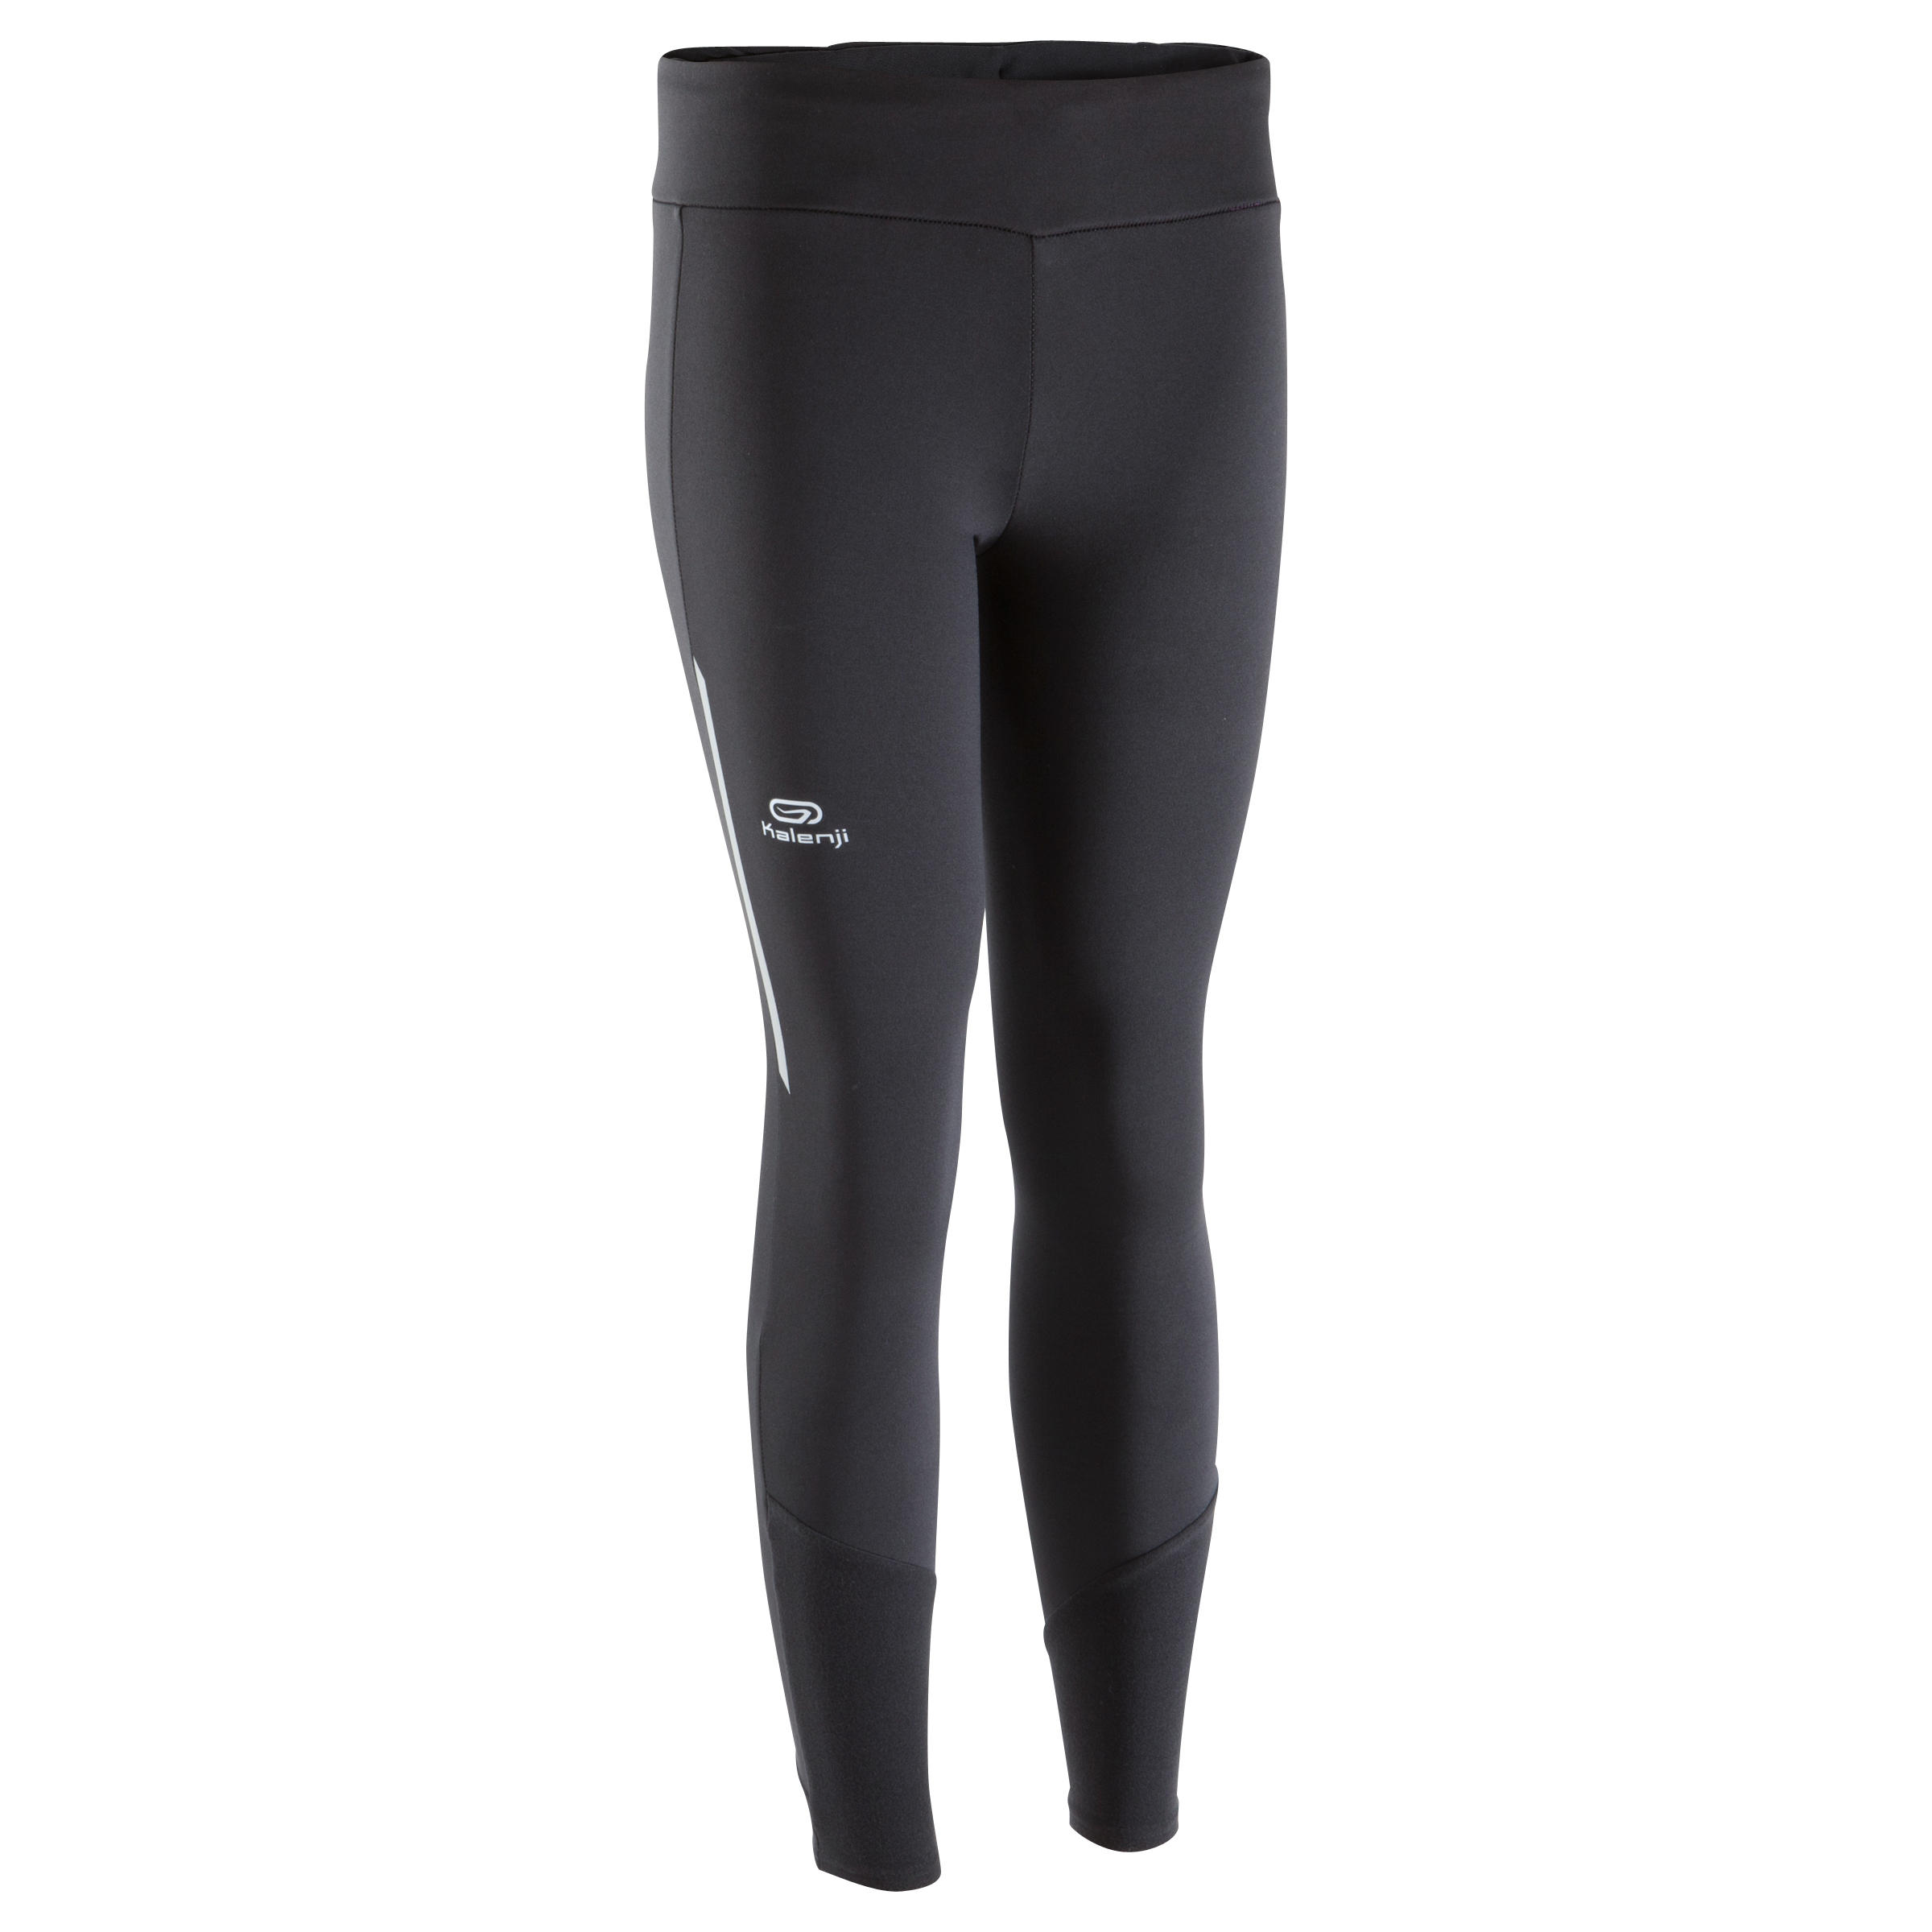 Run Warm Women's Running Tights - Black